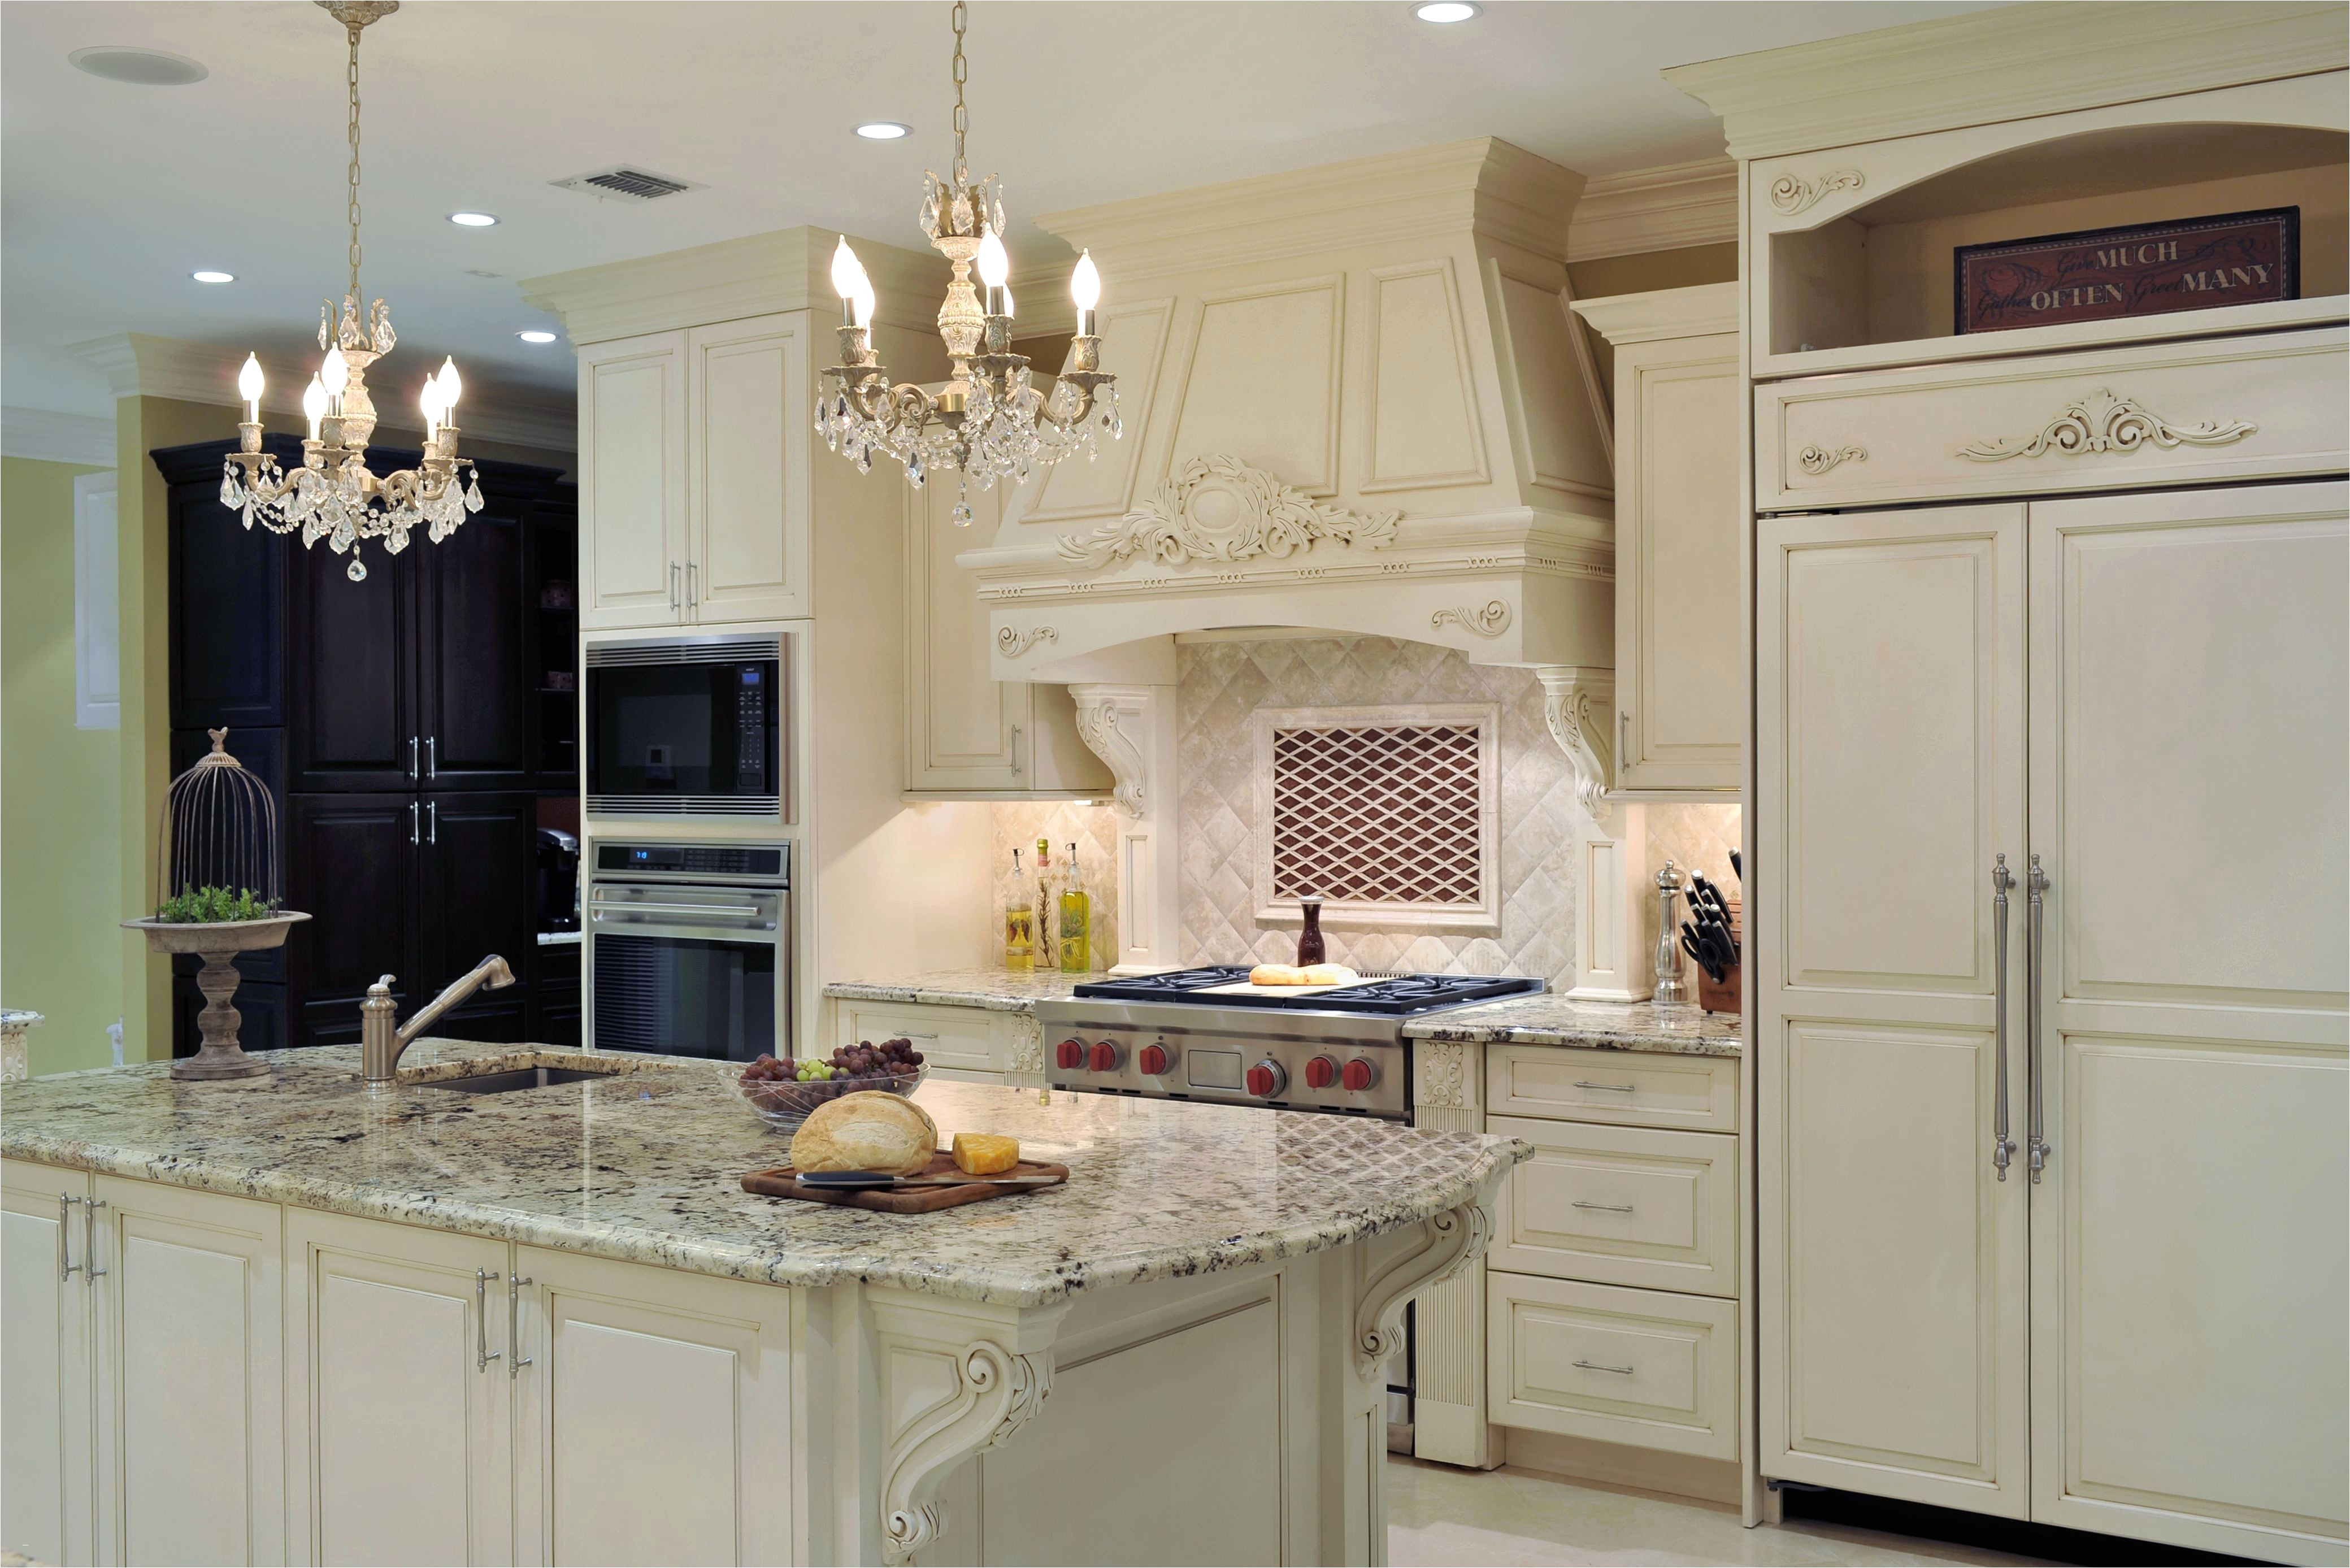 luxury hampton bay cabinet door replacement kitchen cabinet reviews by manufacturer inspirational hampton bay